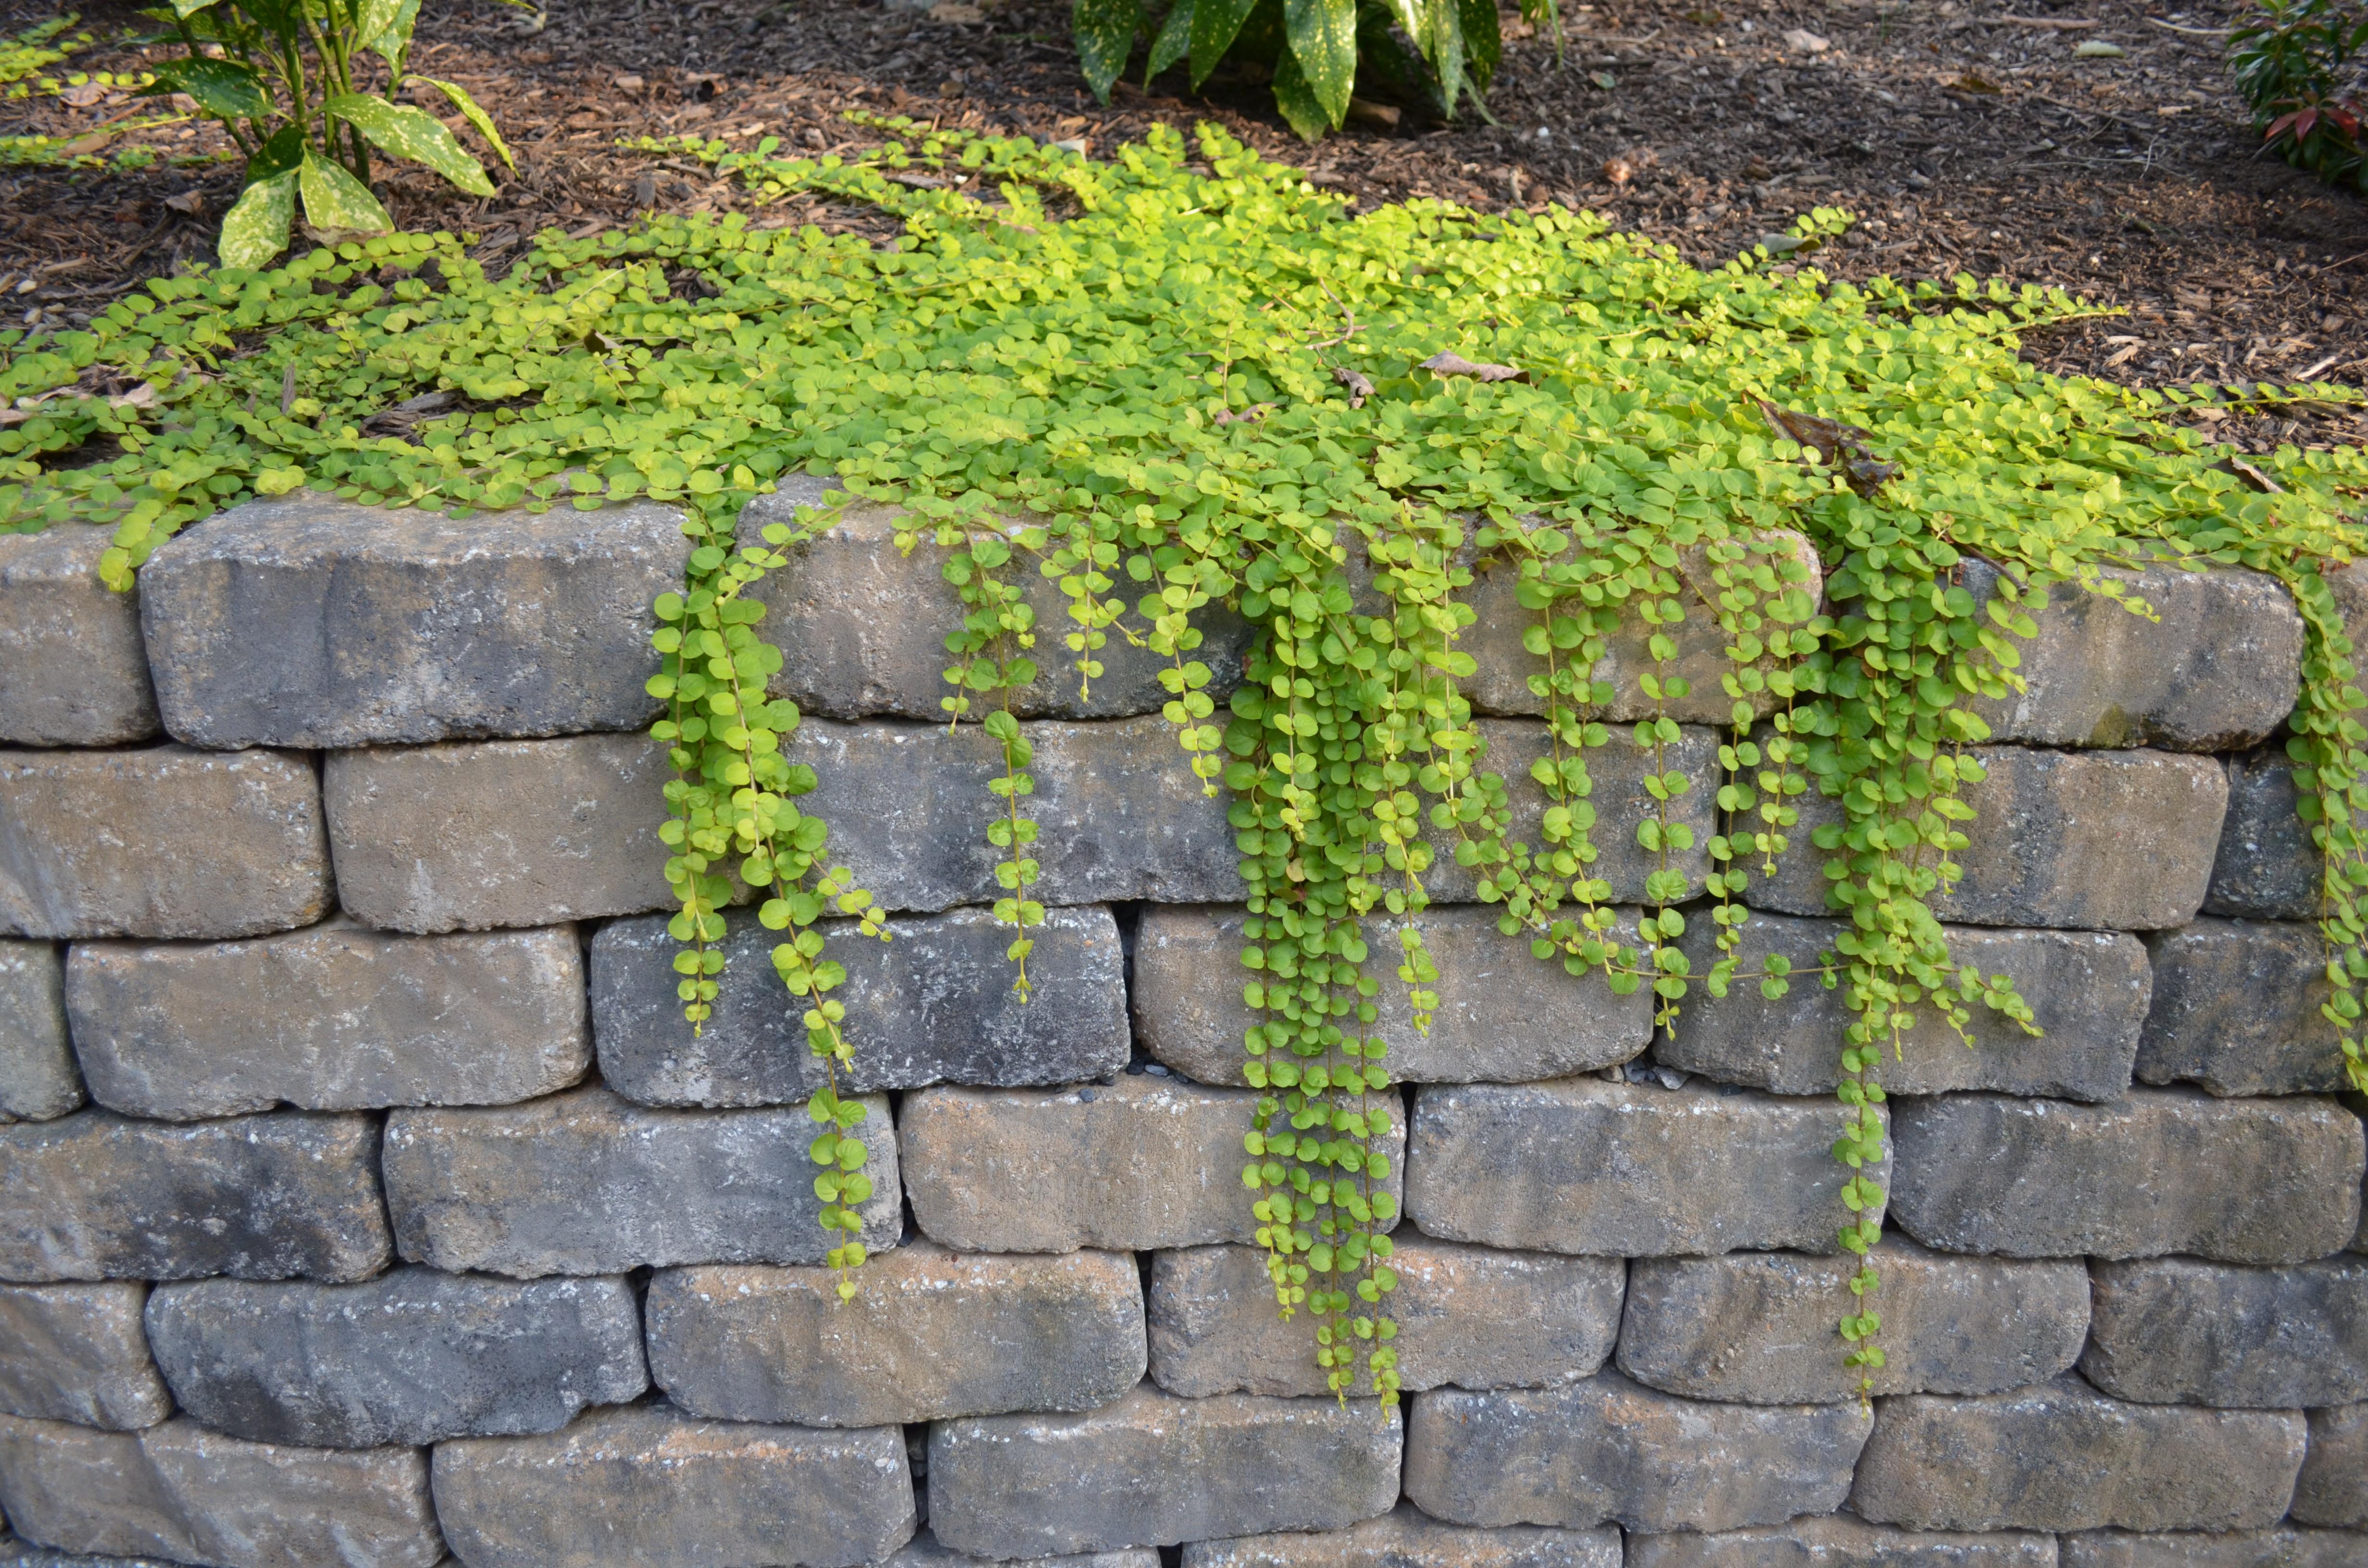 Week 15 – Garden Pics by Smart Jr.